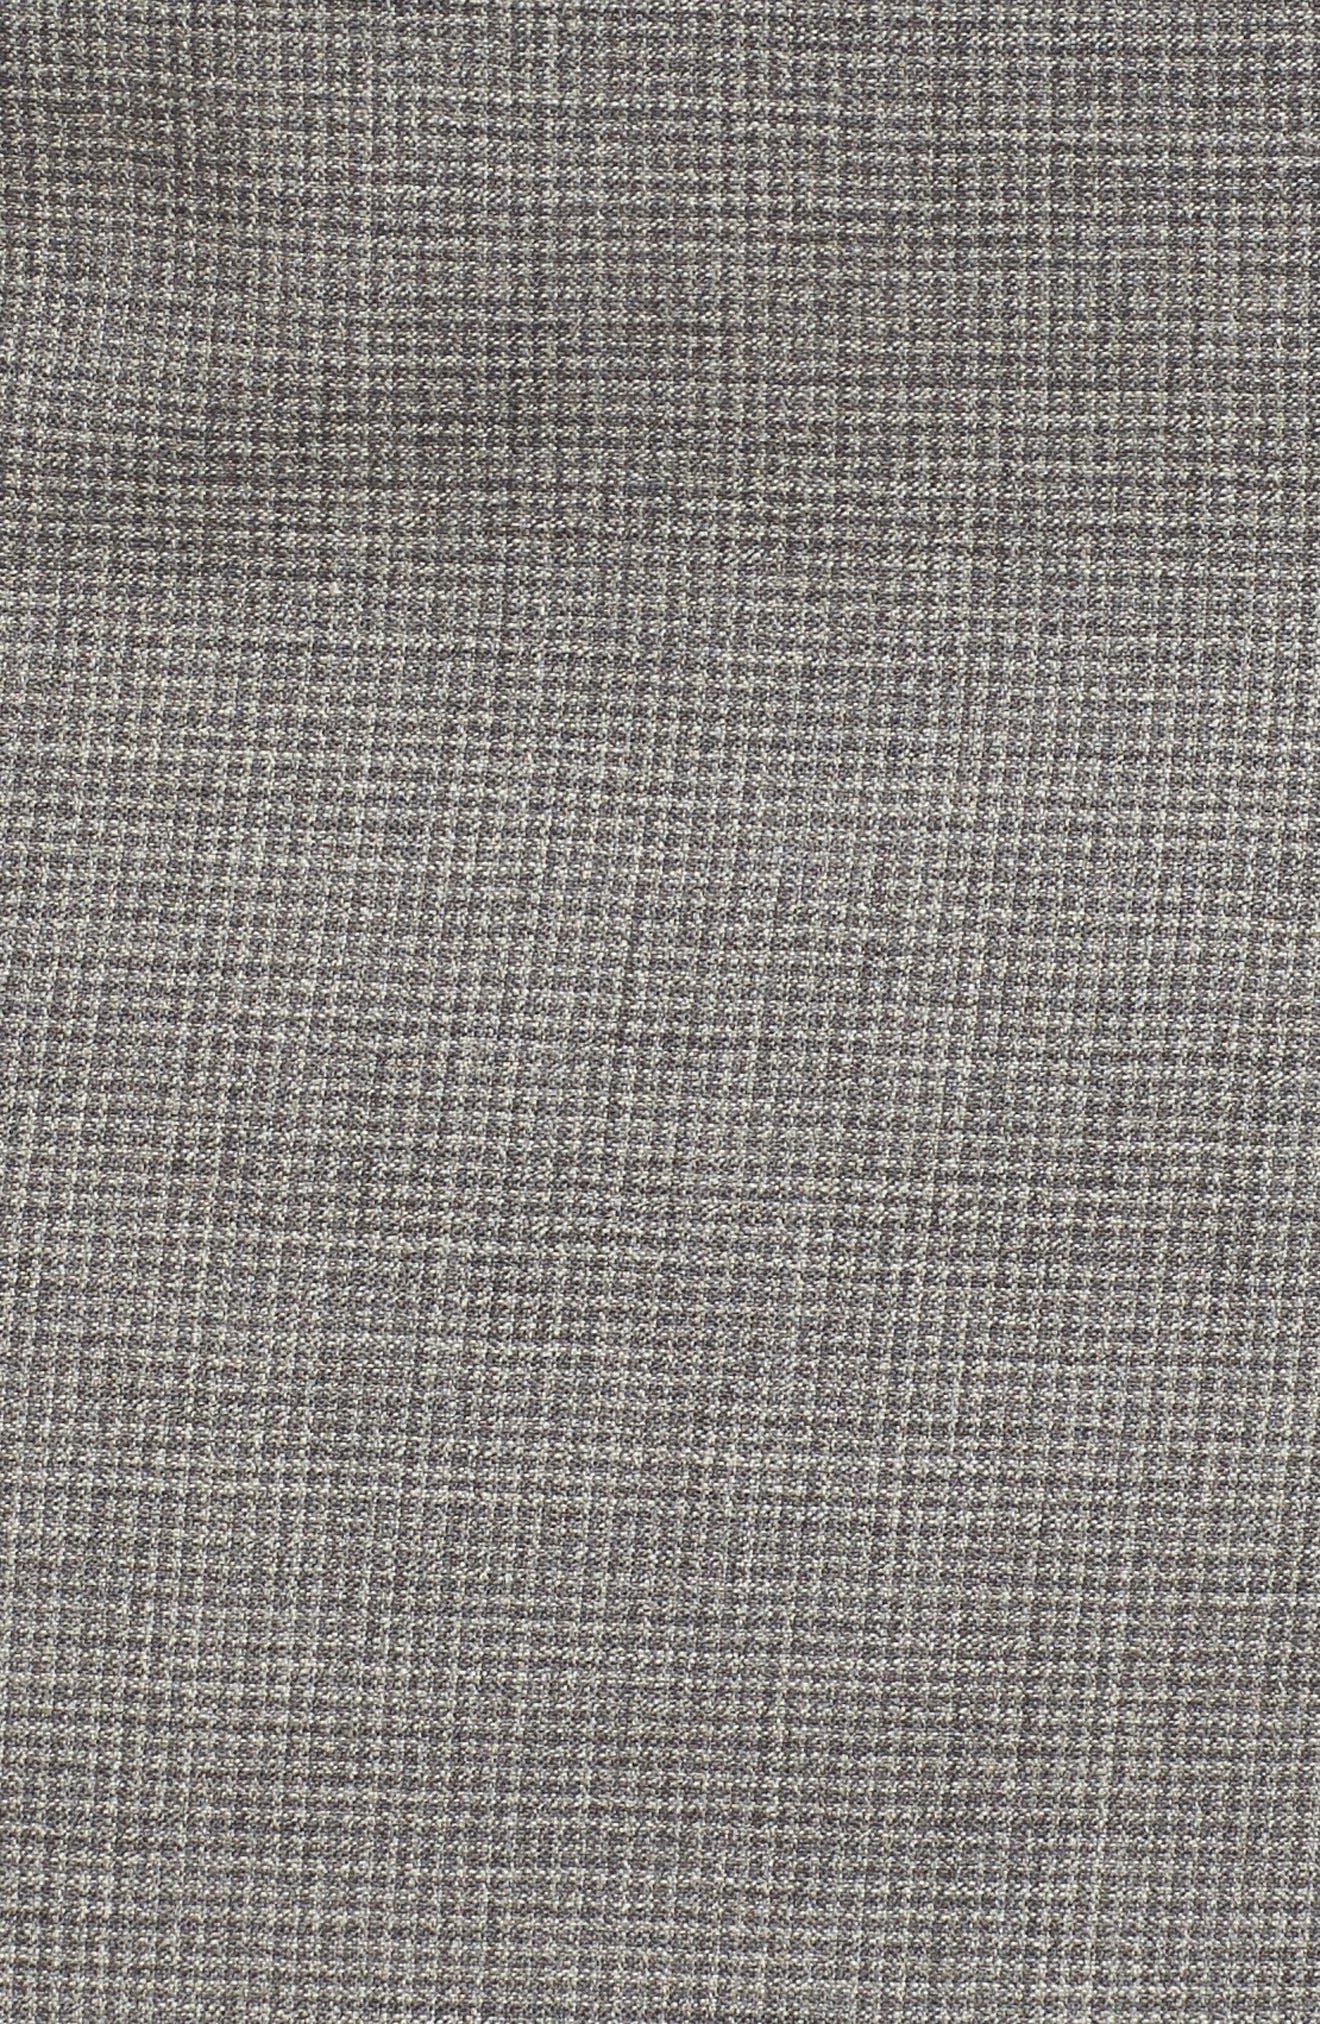 Vewisa Check Wool Suit Skirt,                             Alternate thumbnail 5, color,                             Cozy Grey Melange Fantasy